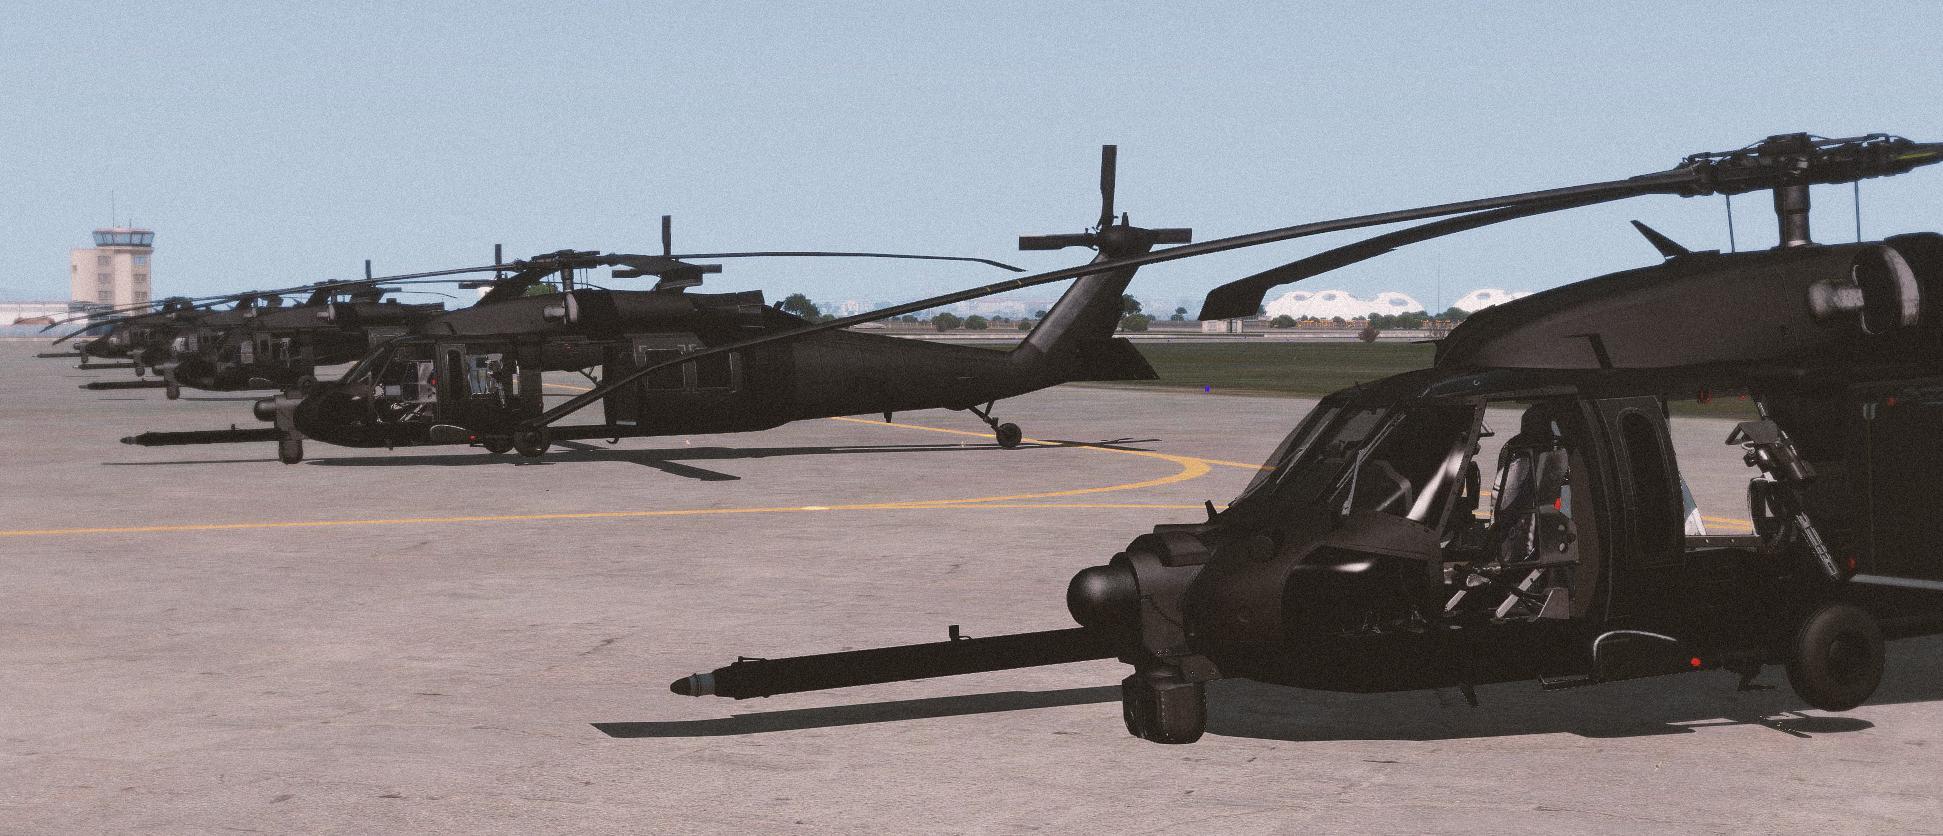 ArmA 3 Clan MilSim - MH 60